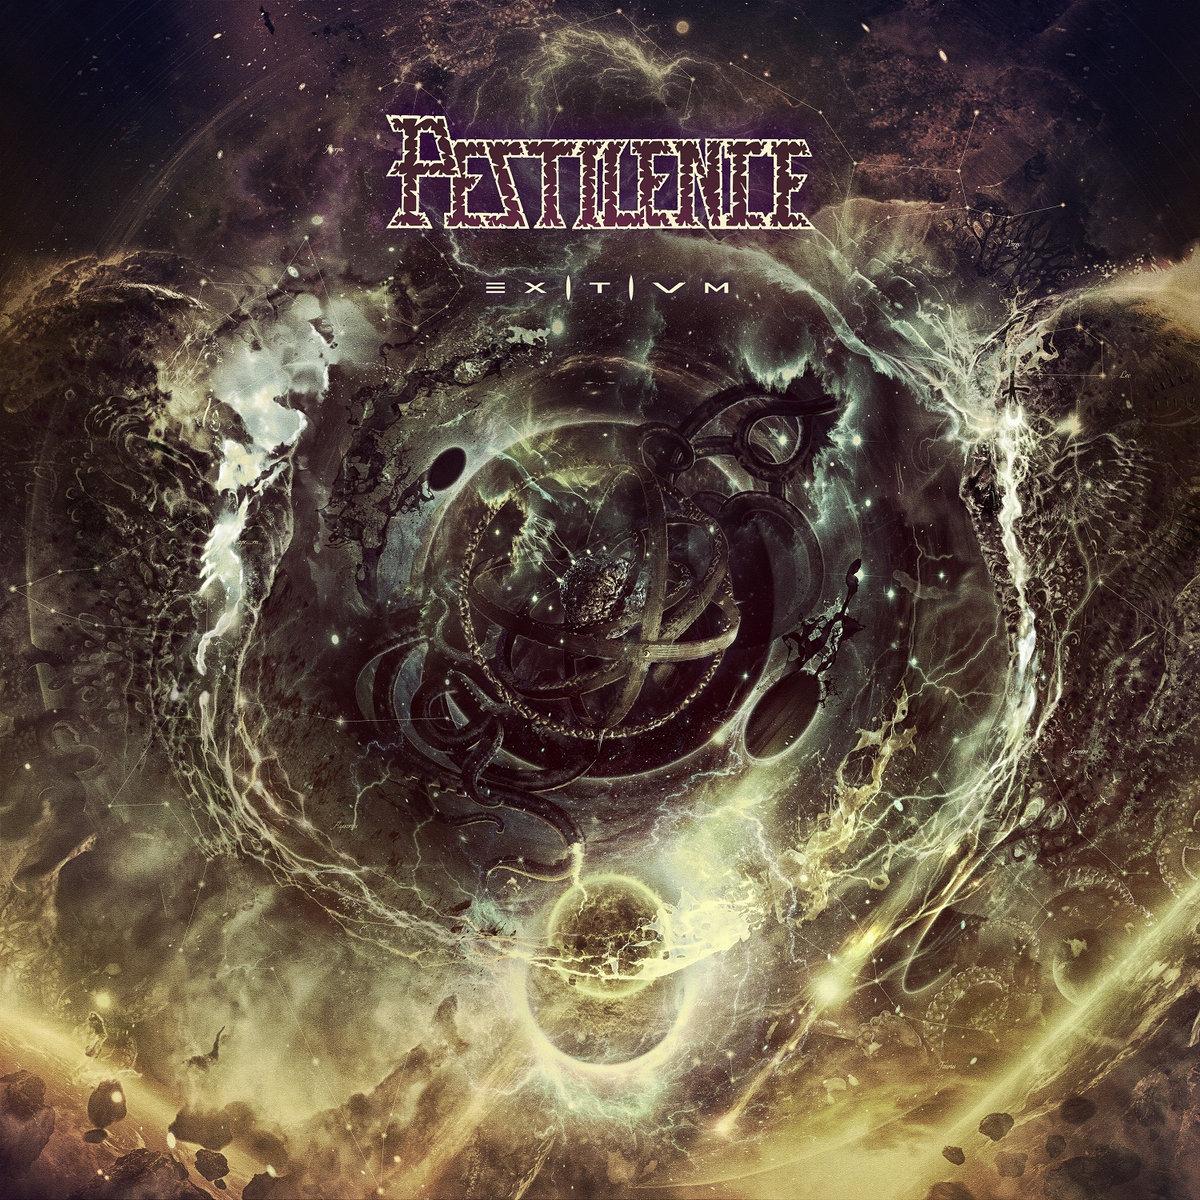 pestilence-exitivm